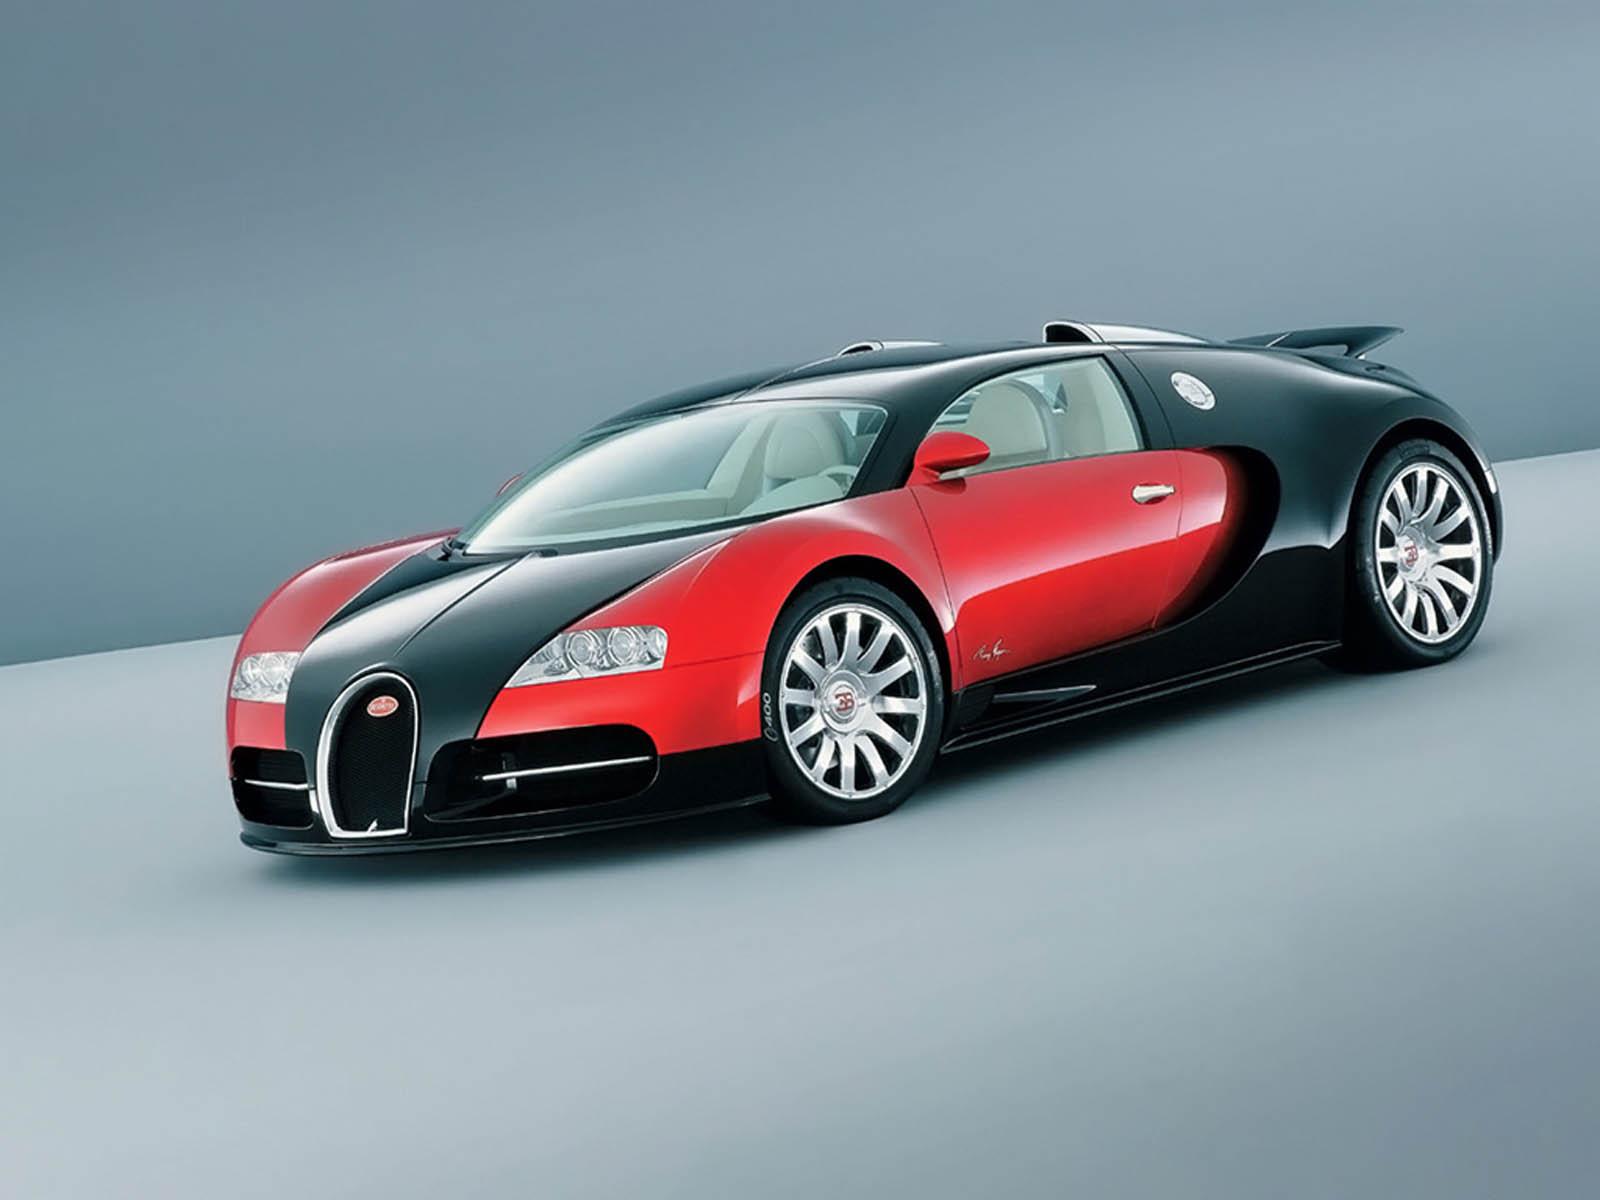 Wallpapers Bugatti Veyron